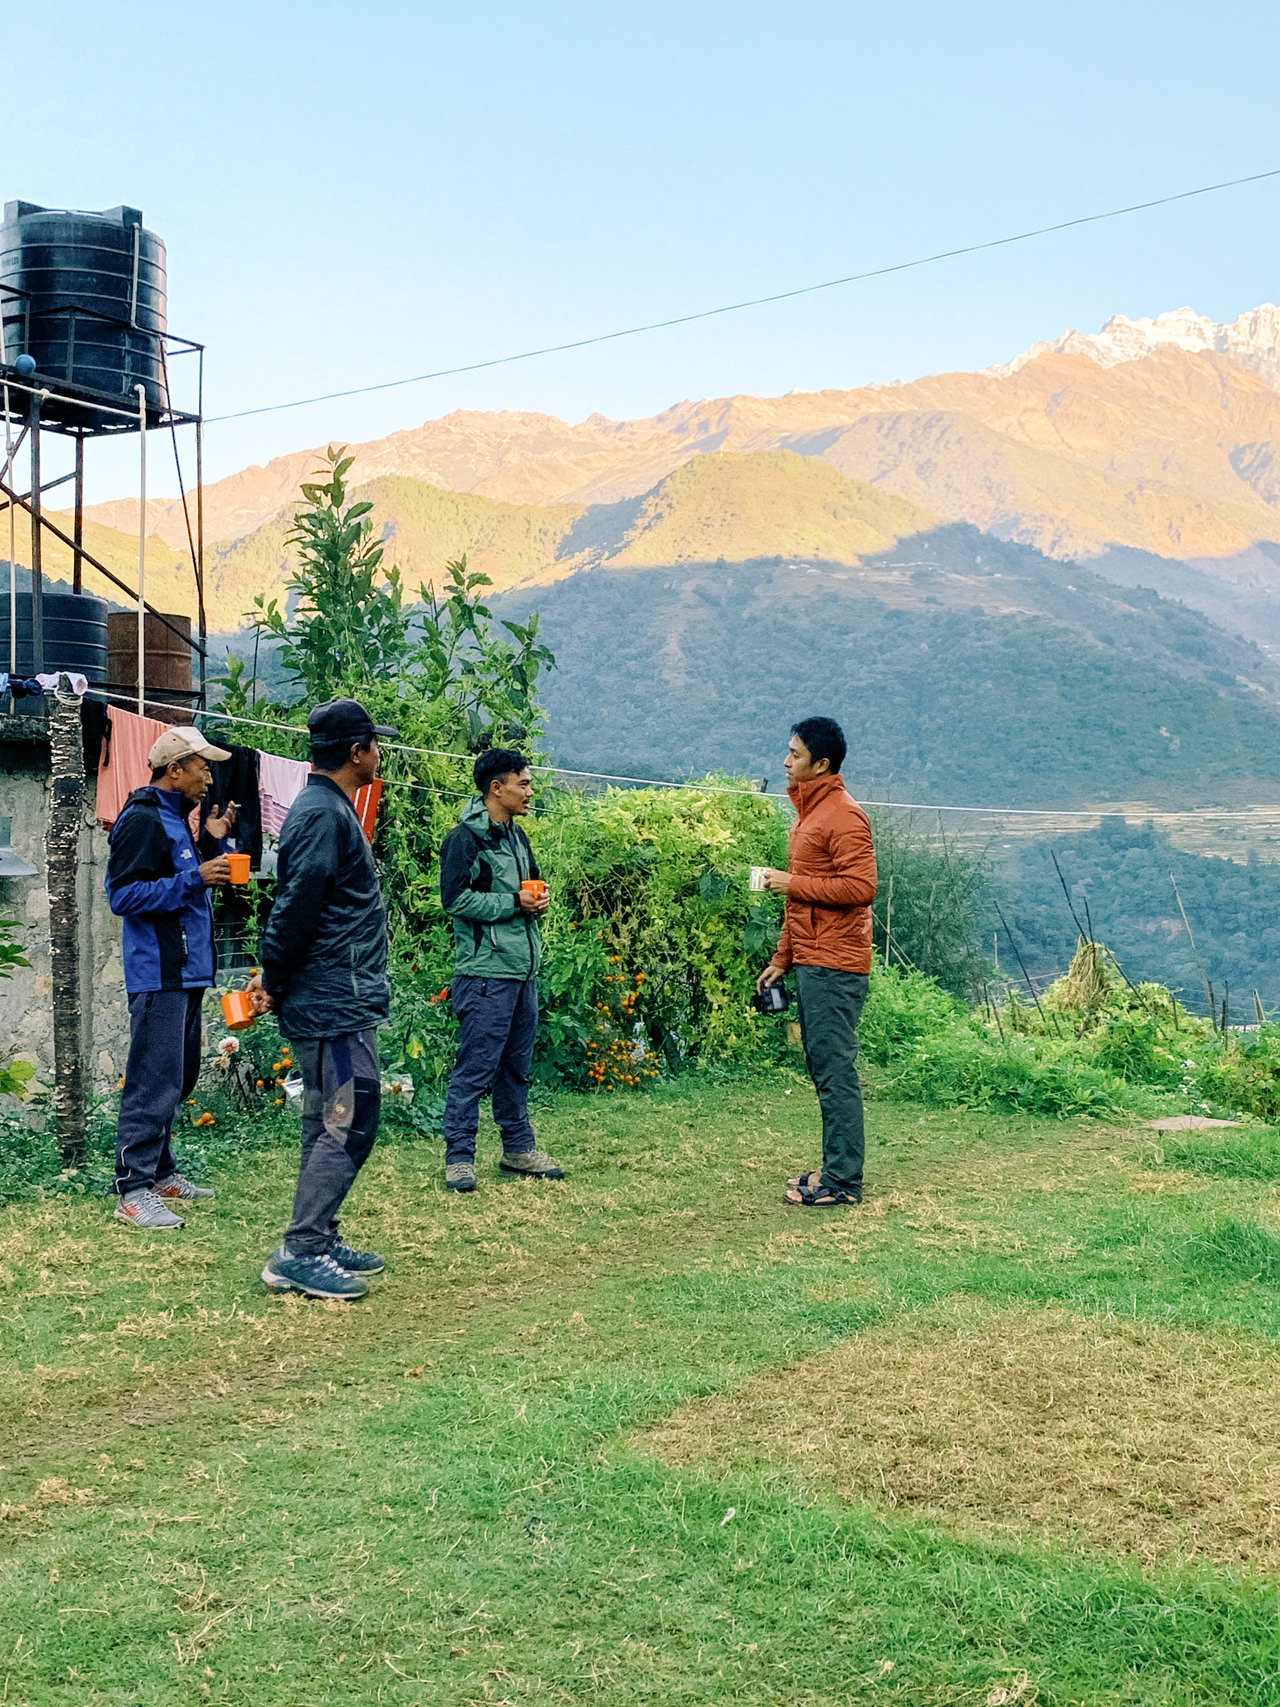 Nepal 2019 - Trekking Annapurna Base Camp 190